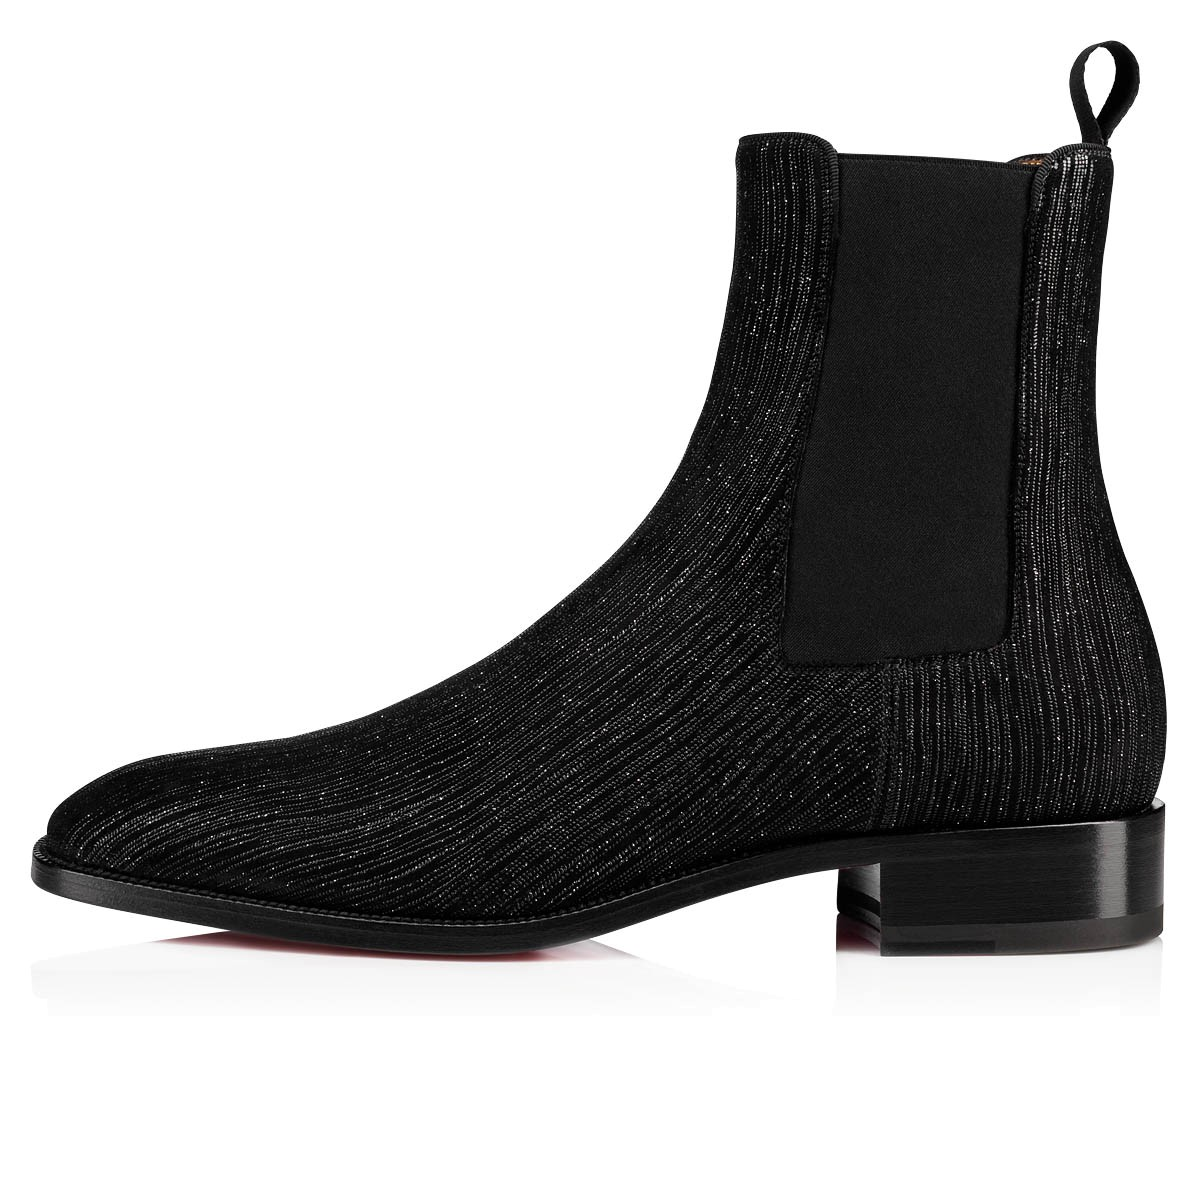 95607be4f3b SAMSON ORLATO Black Crosta Shower - Men Shoes - Christian Louboutin